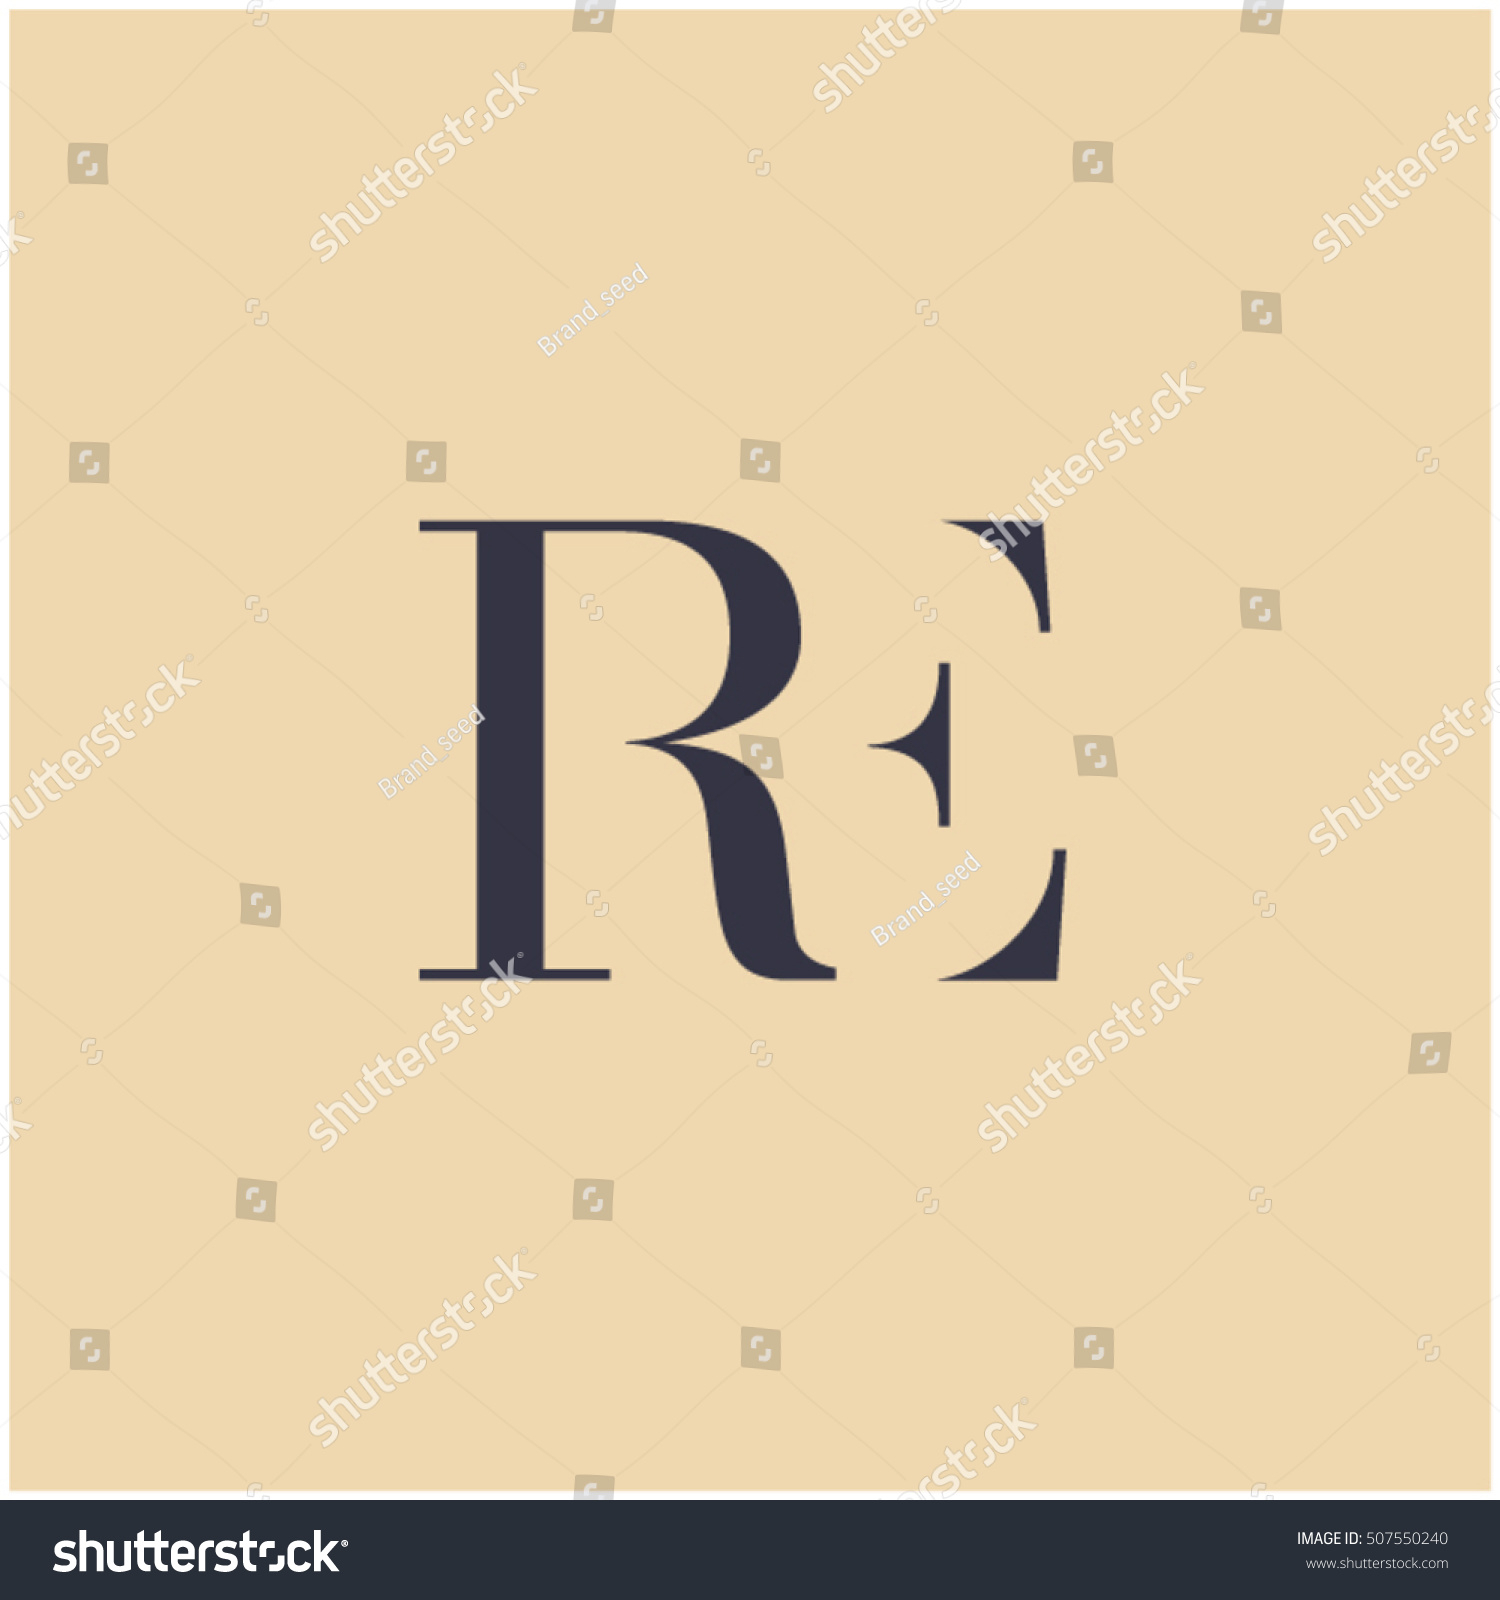 Er Symbol Er Letter E Letter Stock Vector (Royalty Free with regard to Er Symbol